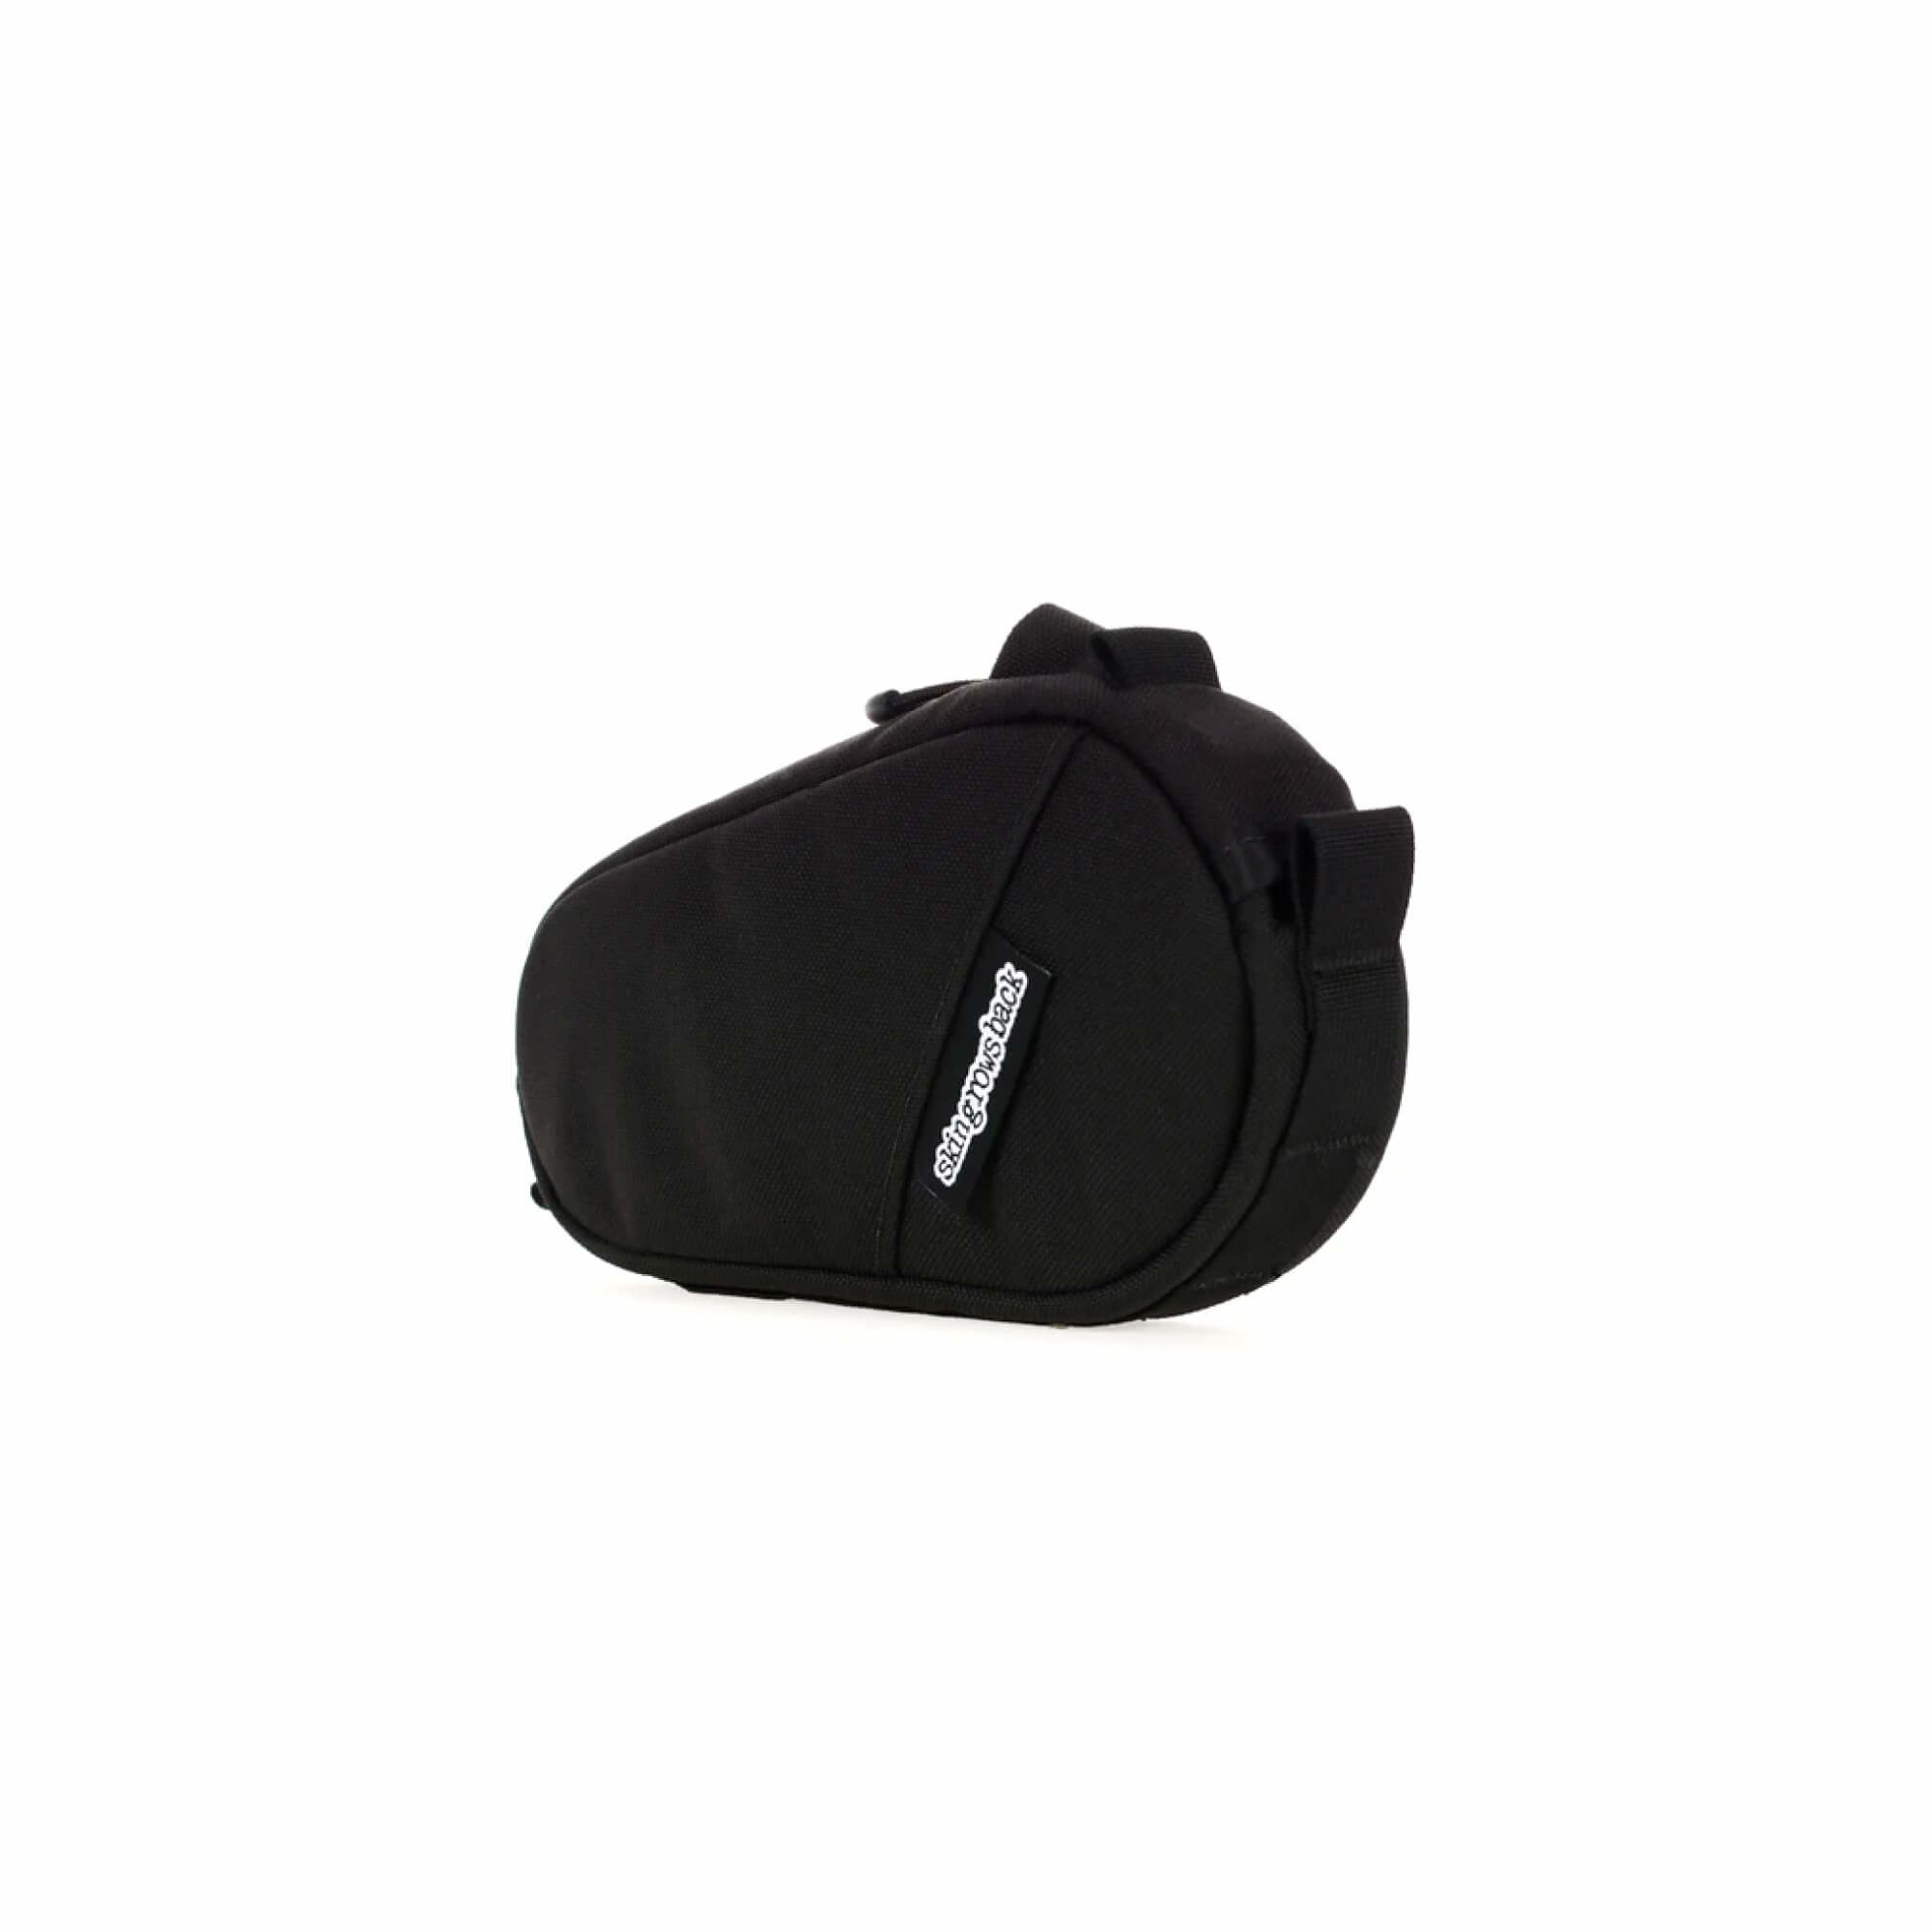 Amigo Top Tube Bag Black-6